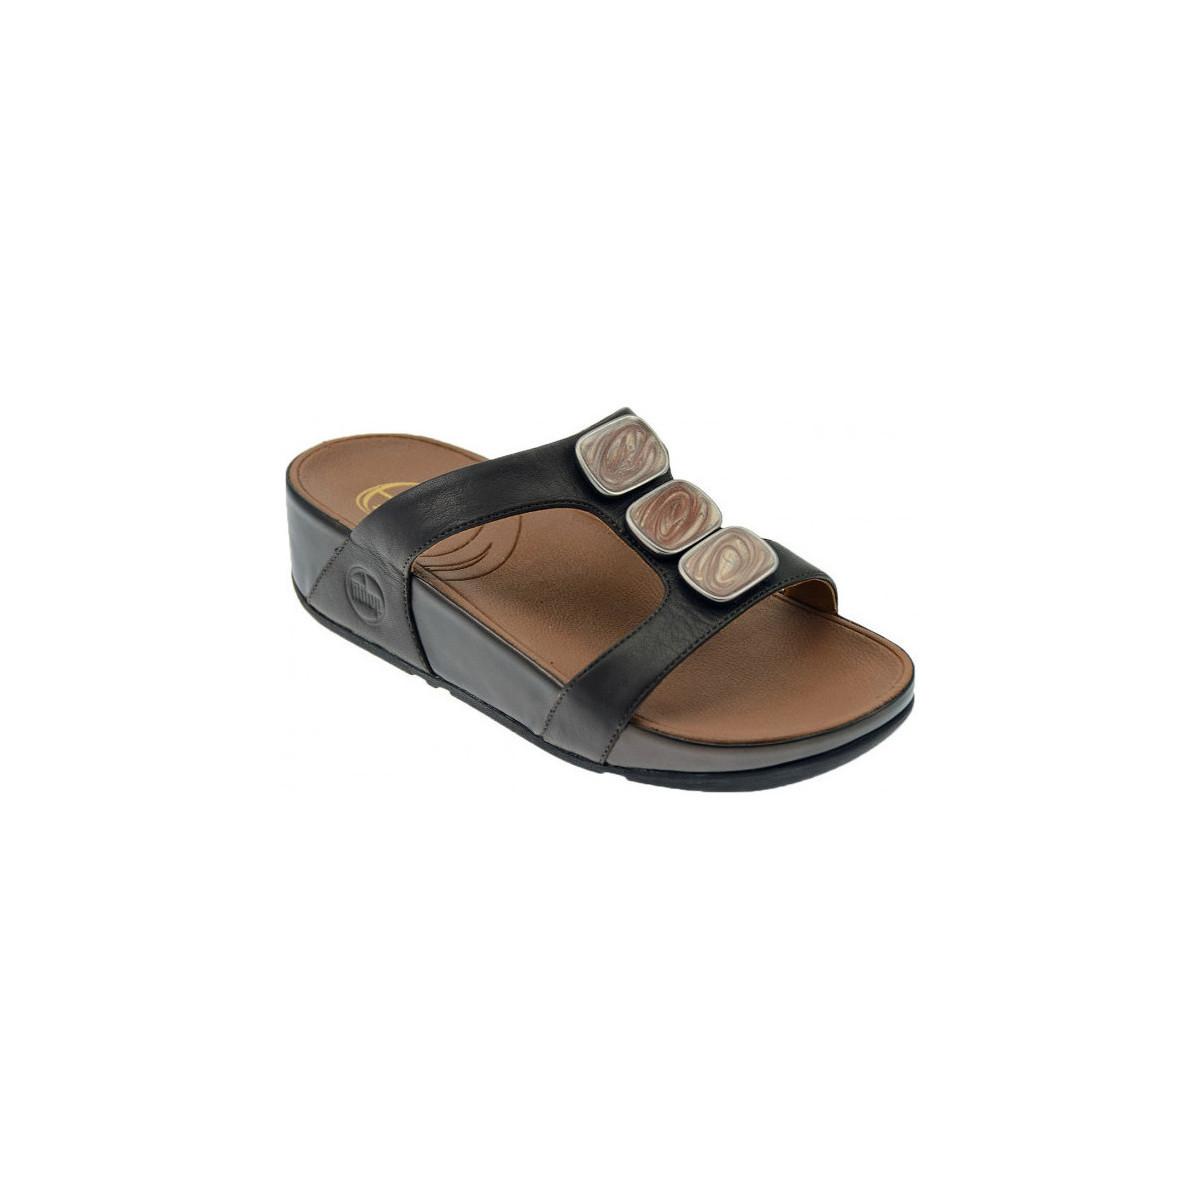 FitFlop Pietra due slide ciabatta fascia sandale  - Schuhe Sandalen / Sandaletten Damen 79,90 €